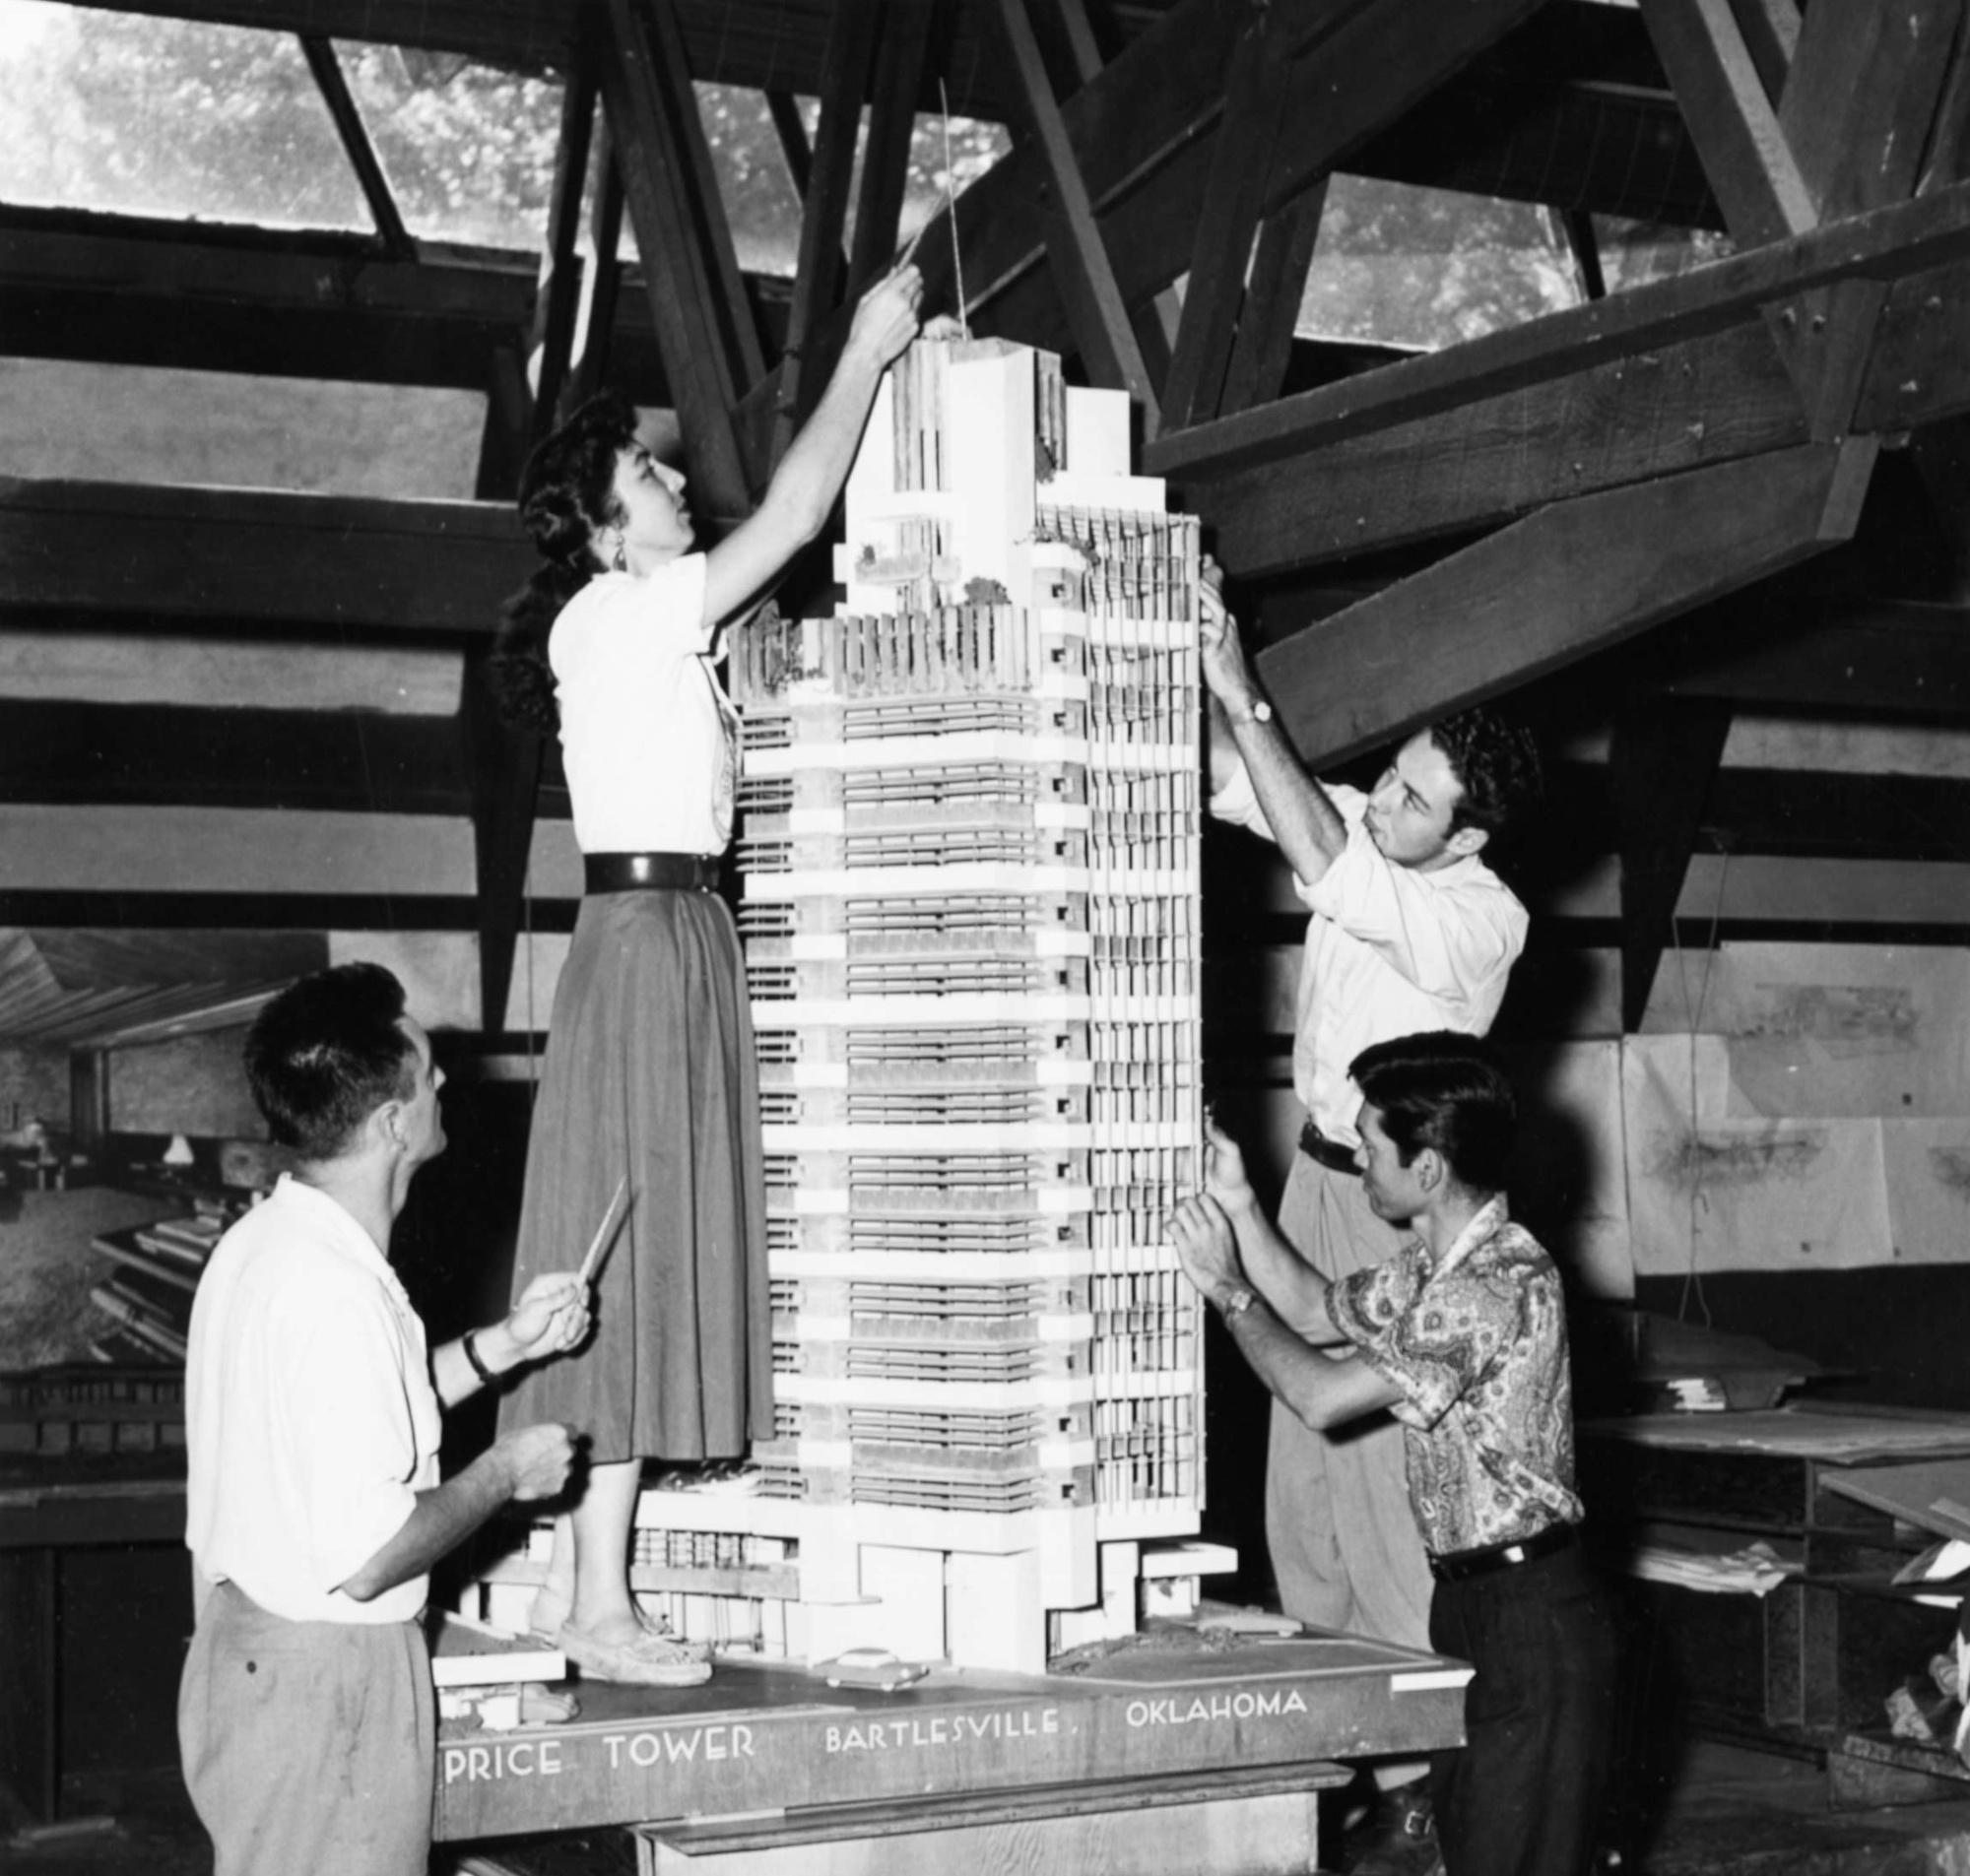 Price Company Tower